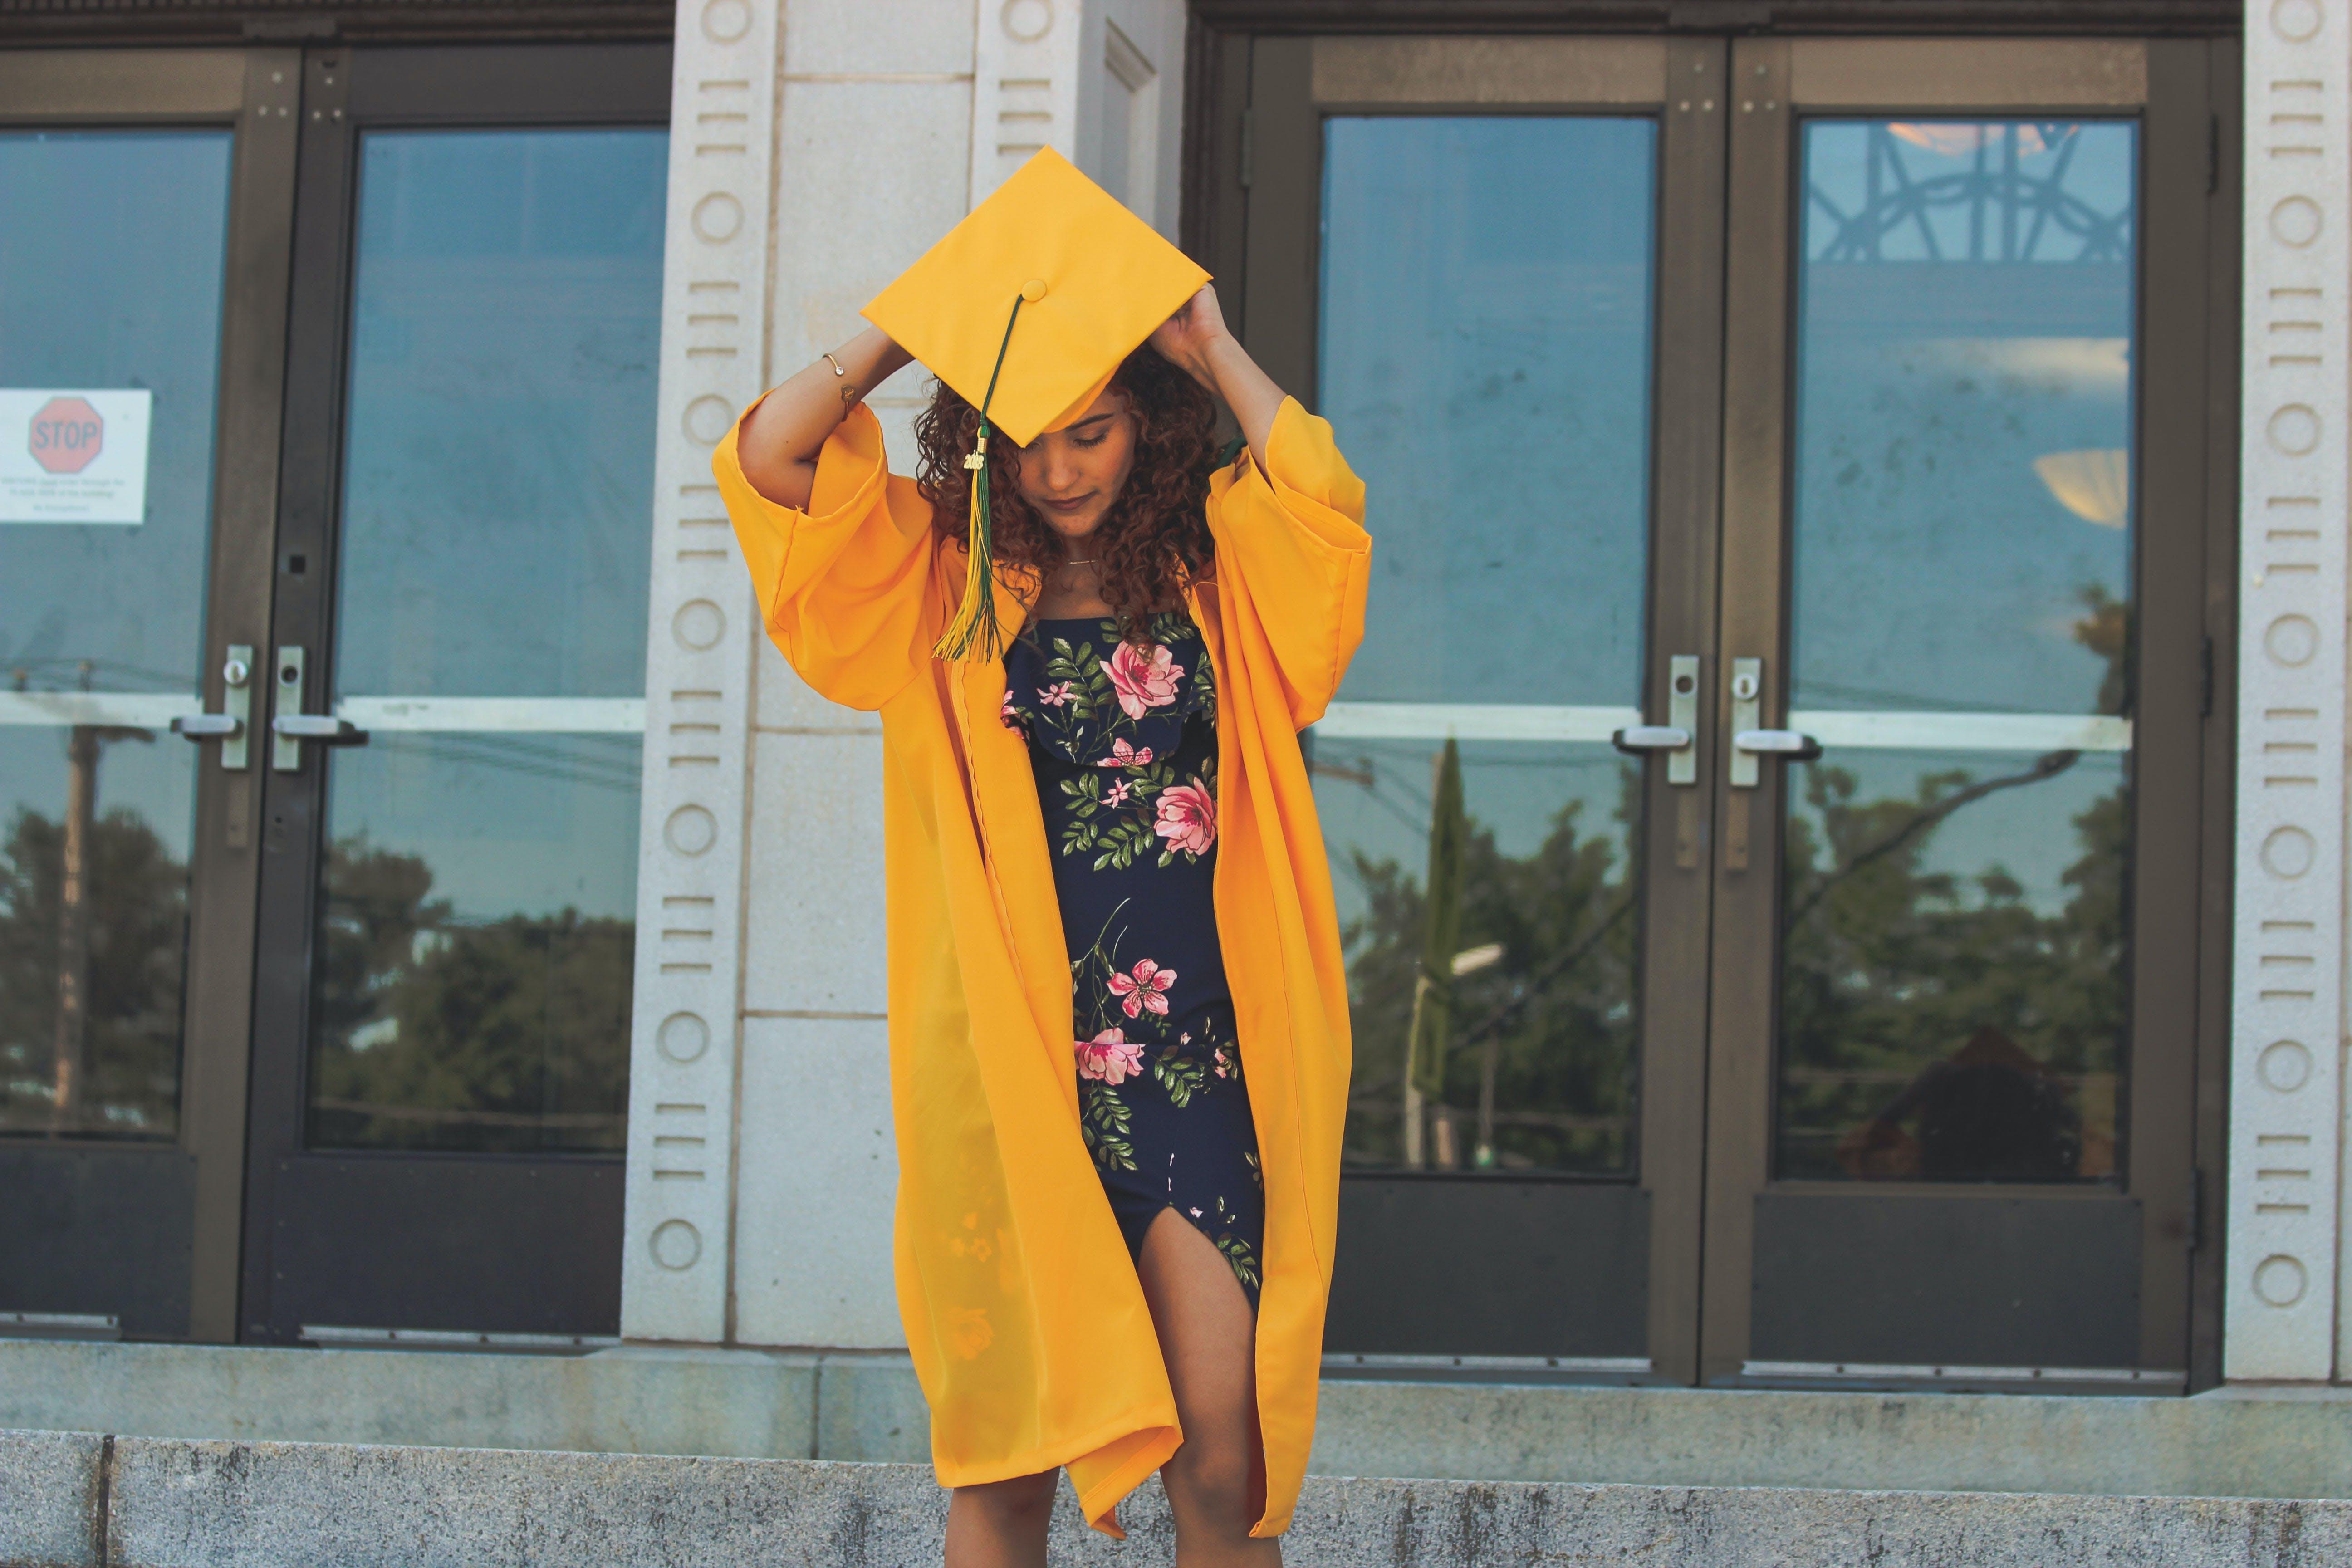 Woman Wearing Academic Dress